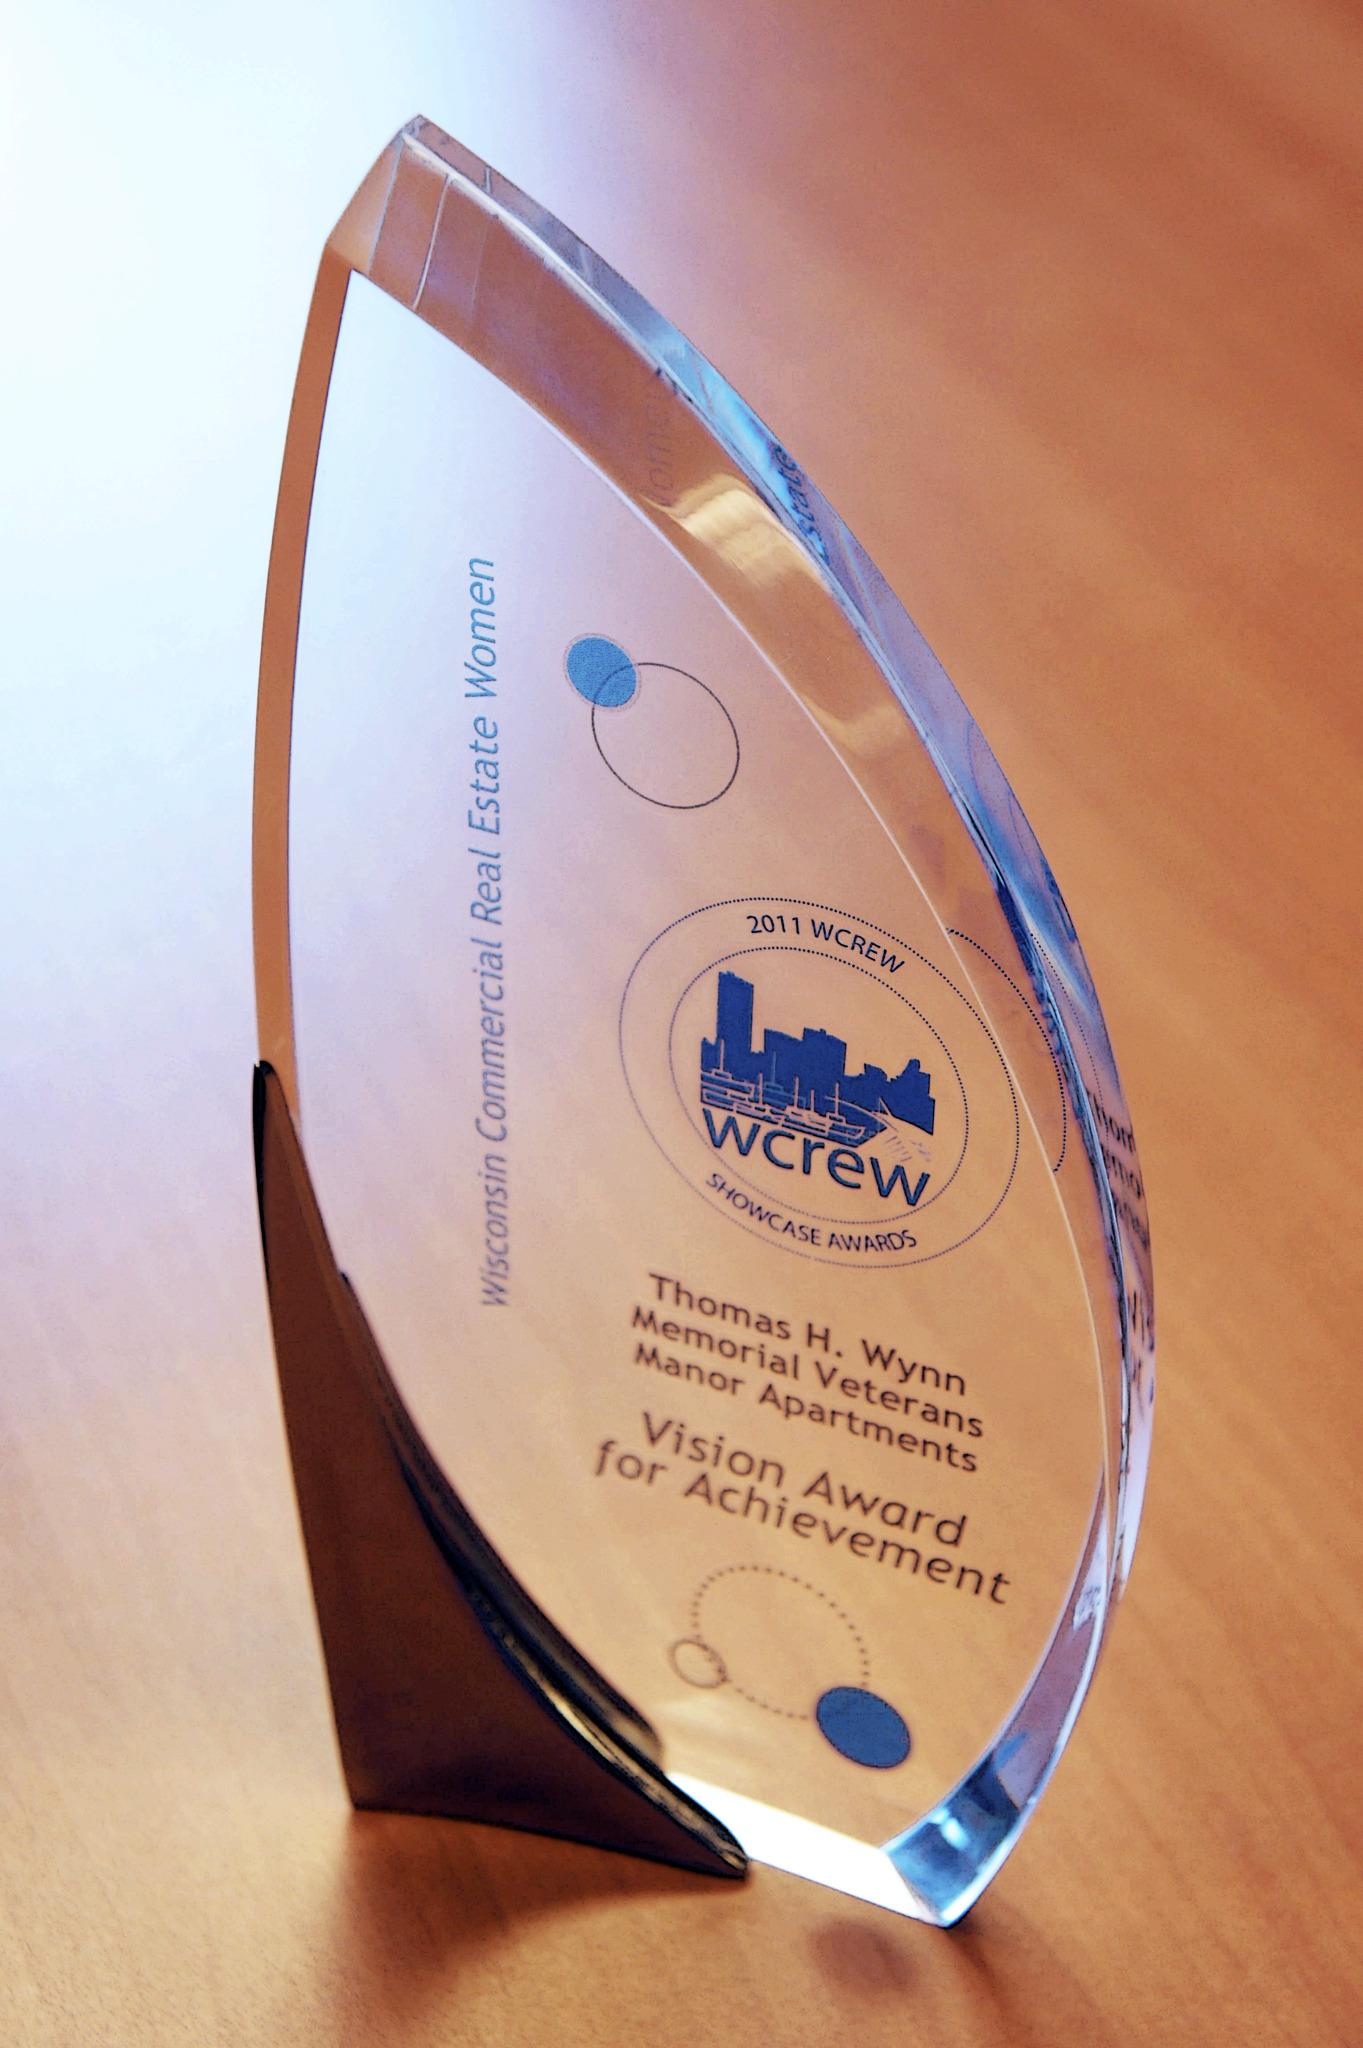 2011 WCREW Showcase Awards